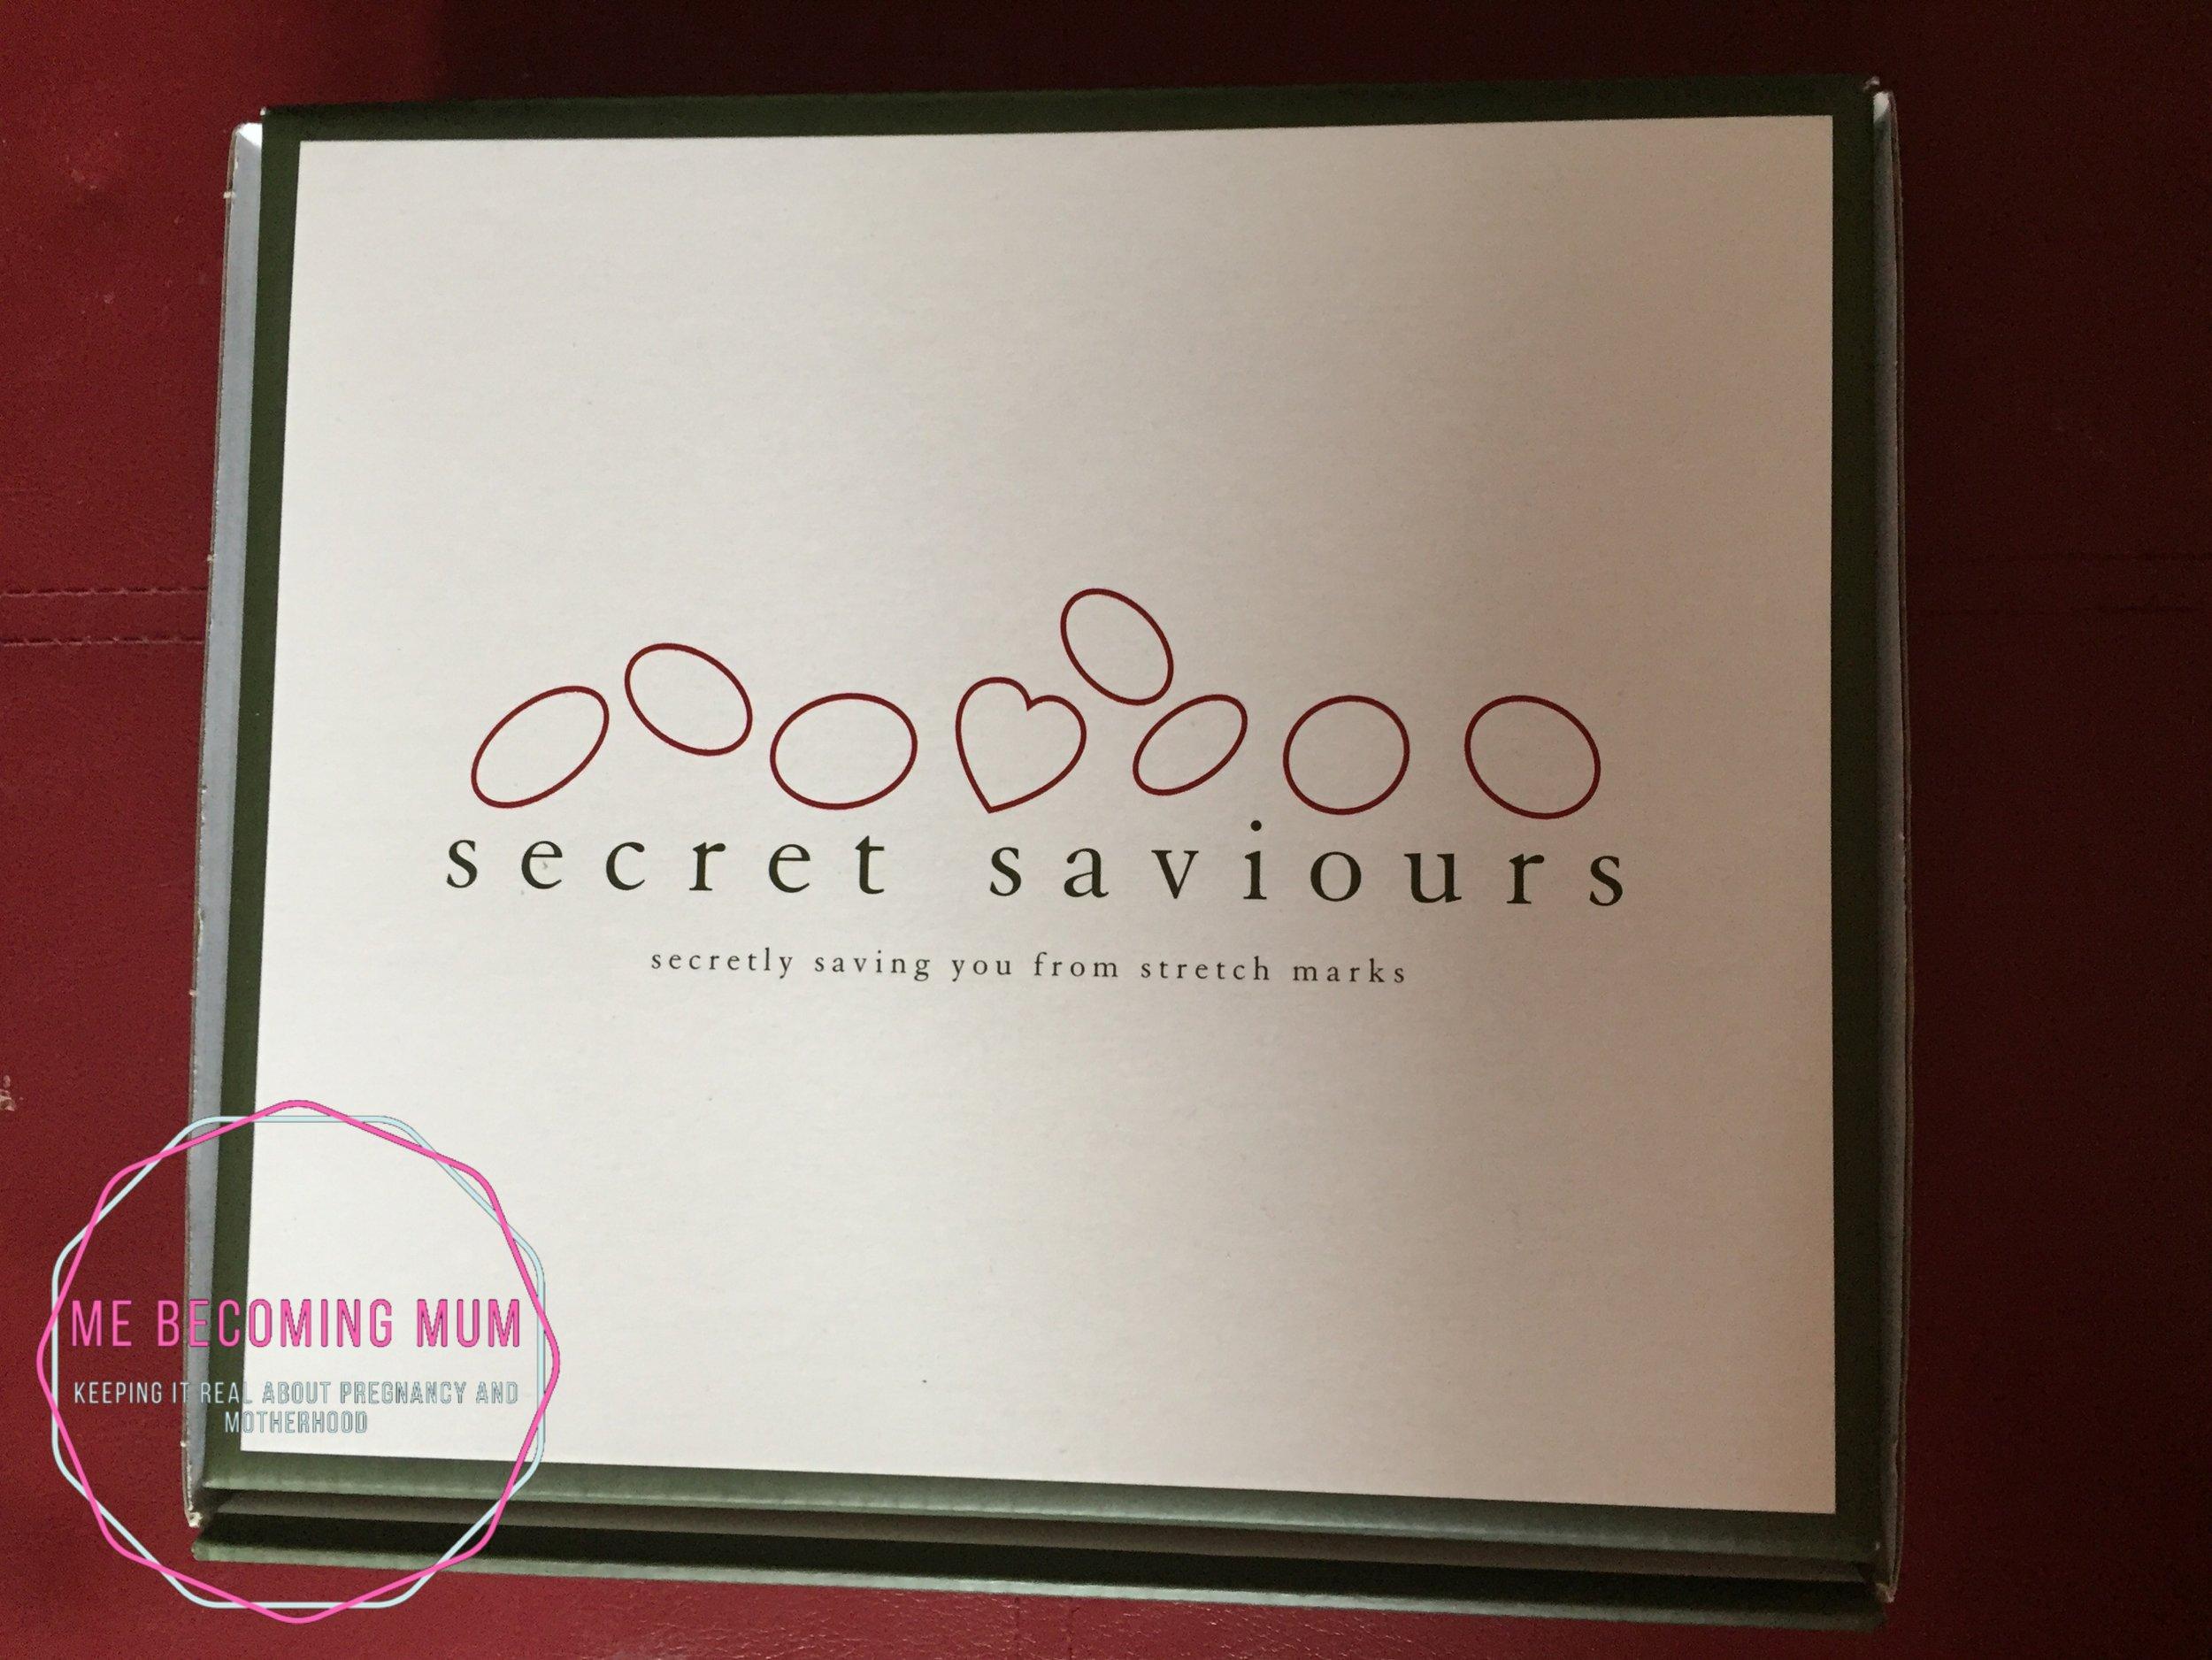 Secret Saviours belly band and cream kit